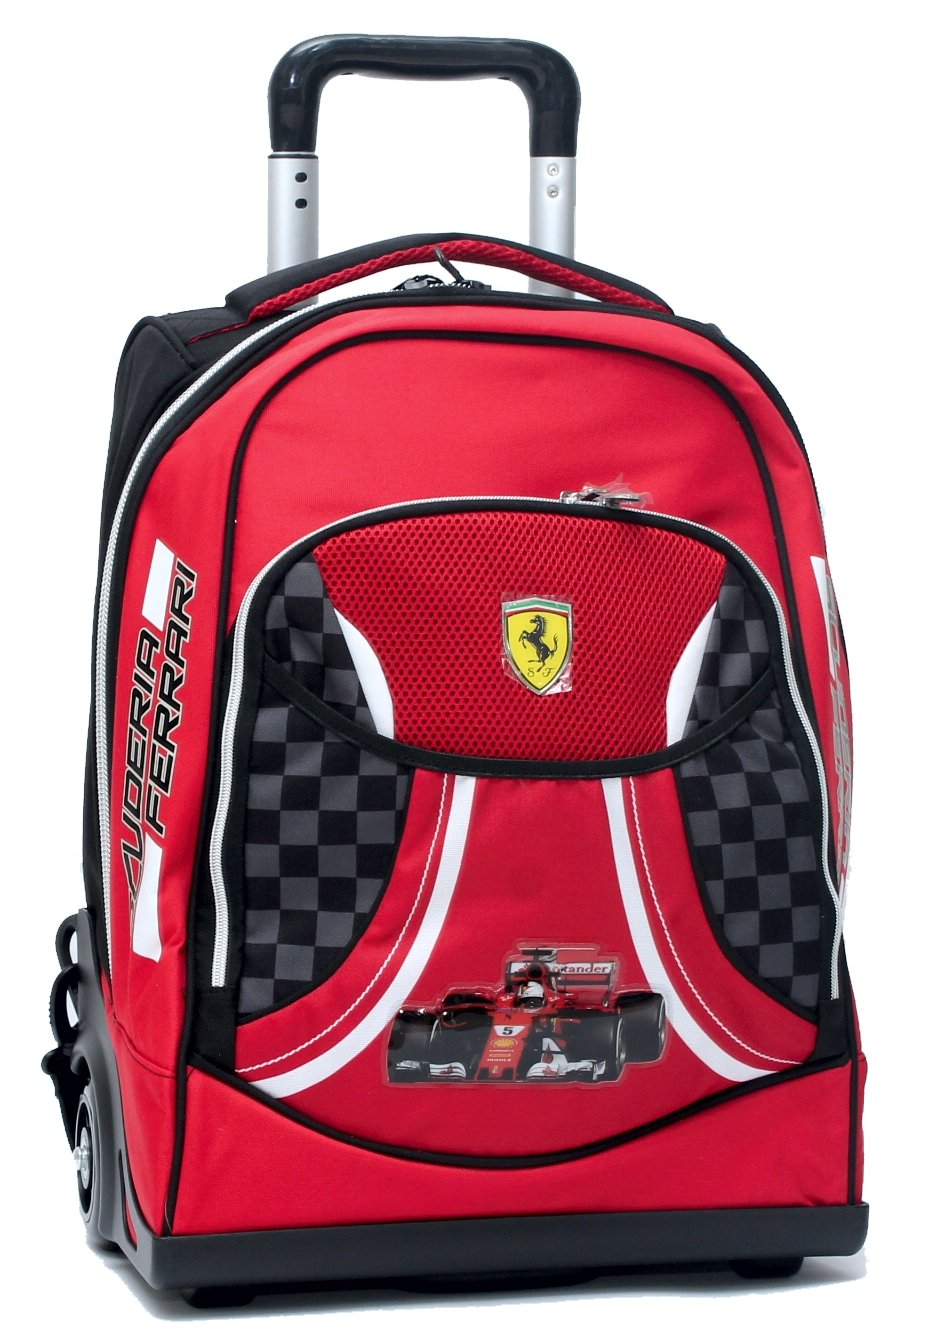 Zaino Trolley Premium Ferrari Kids Zaini e borse sportive